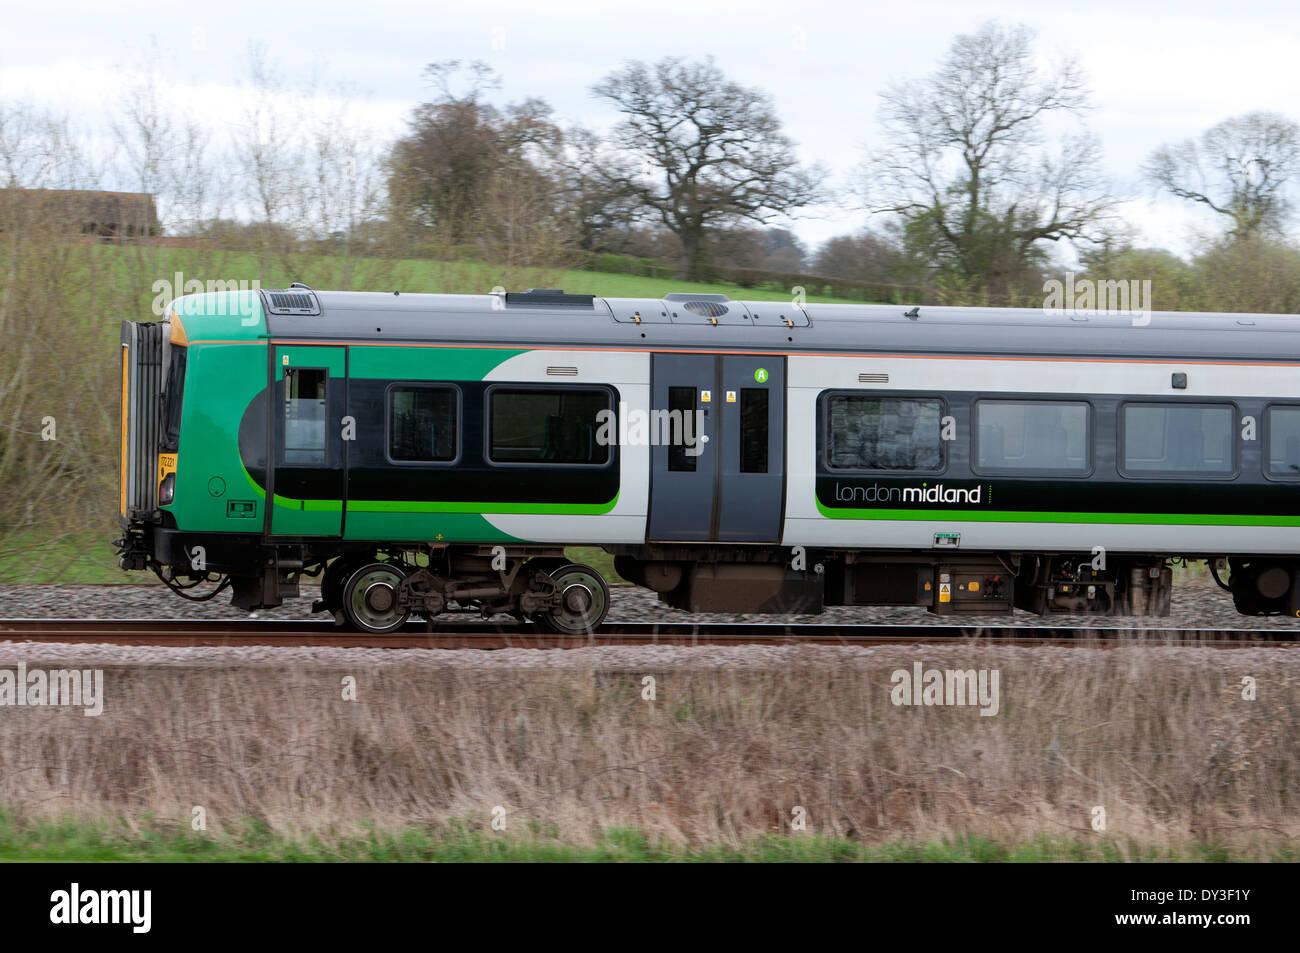 London Midland train, Hatton North Junction, Warwickshire, UK - Stock Image